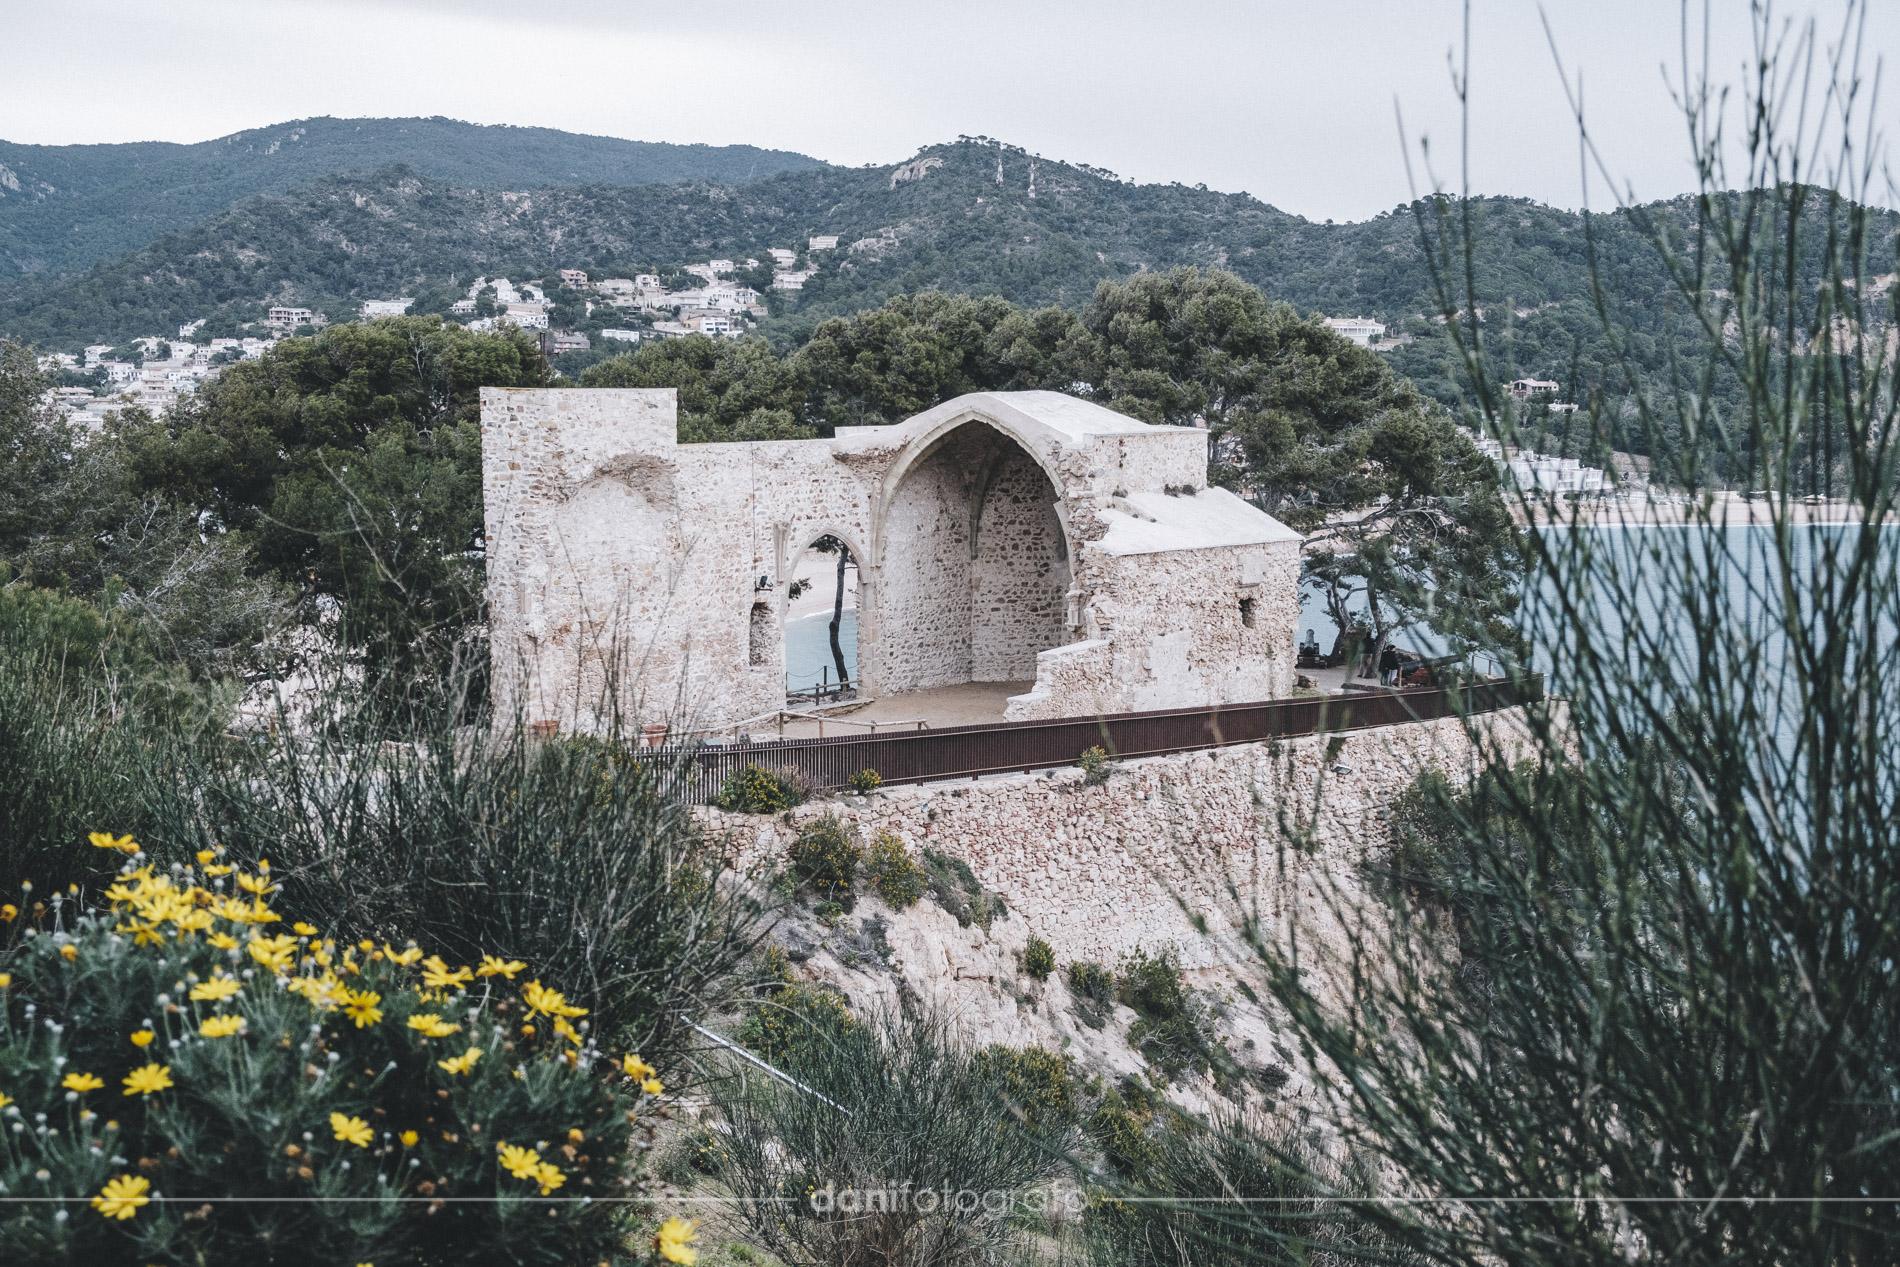 preboda-boda-foto-tossa-mar-girona-cataluna-barcelona-fotos-pareja-novios-fotografo